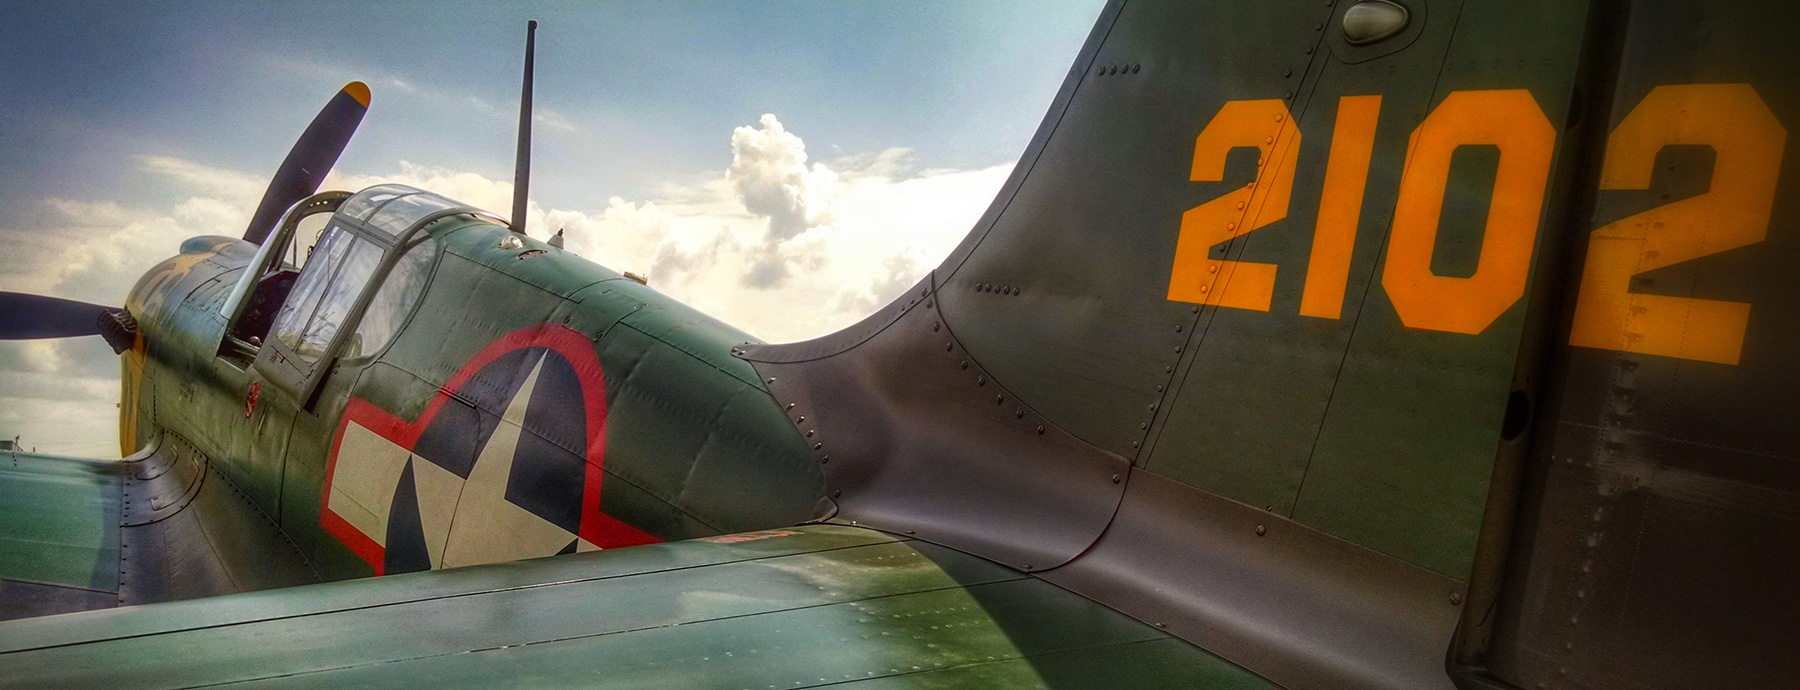 P-40 by Tom Miller